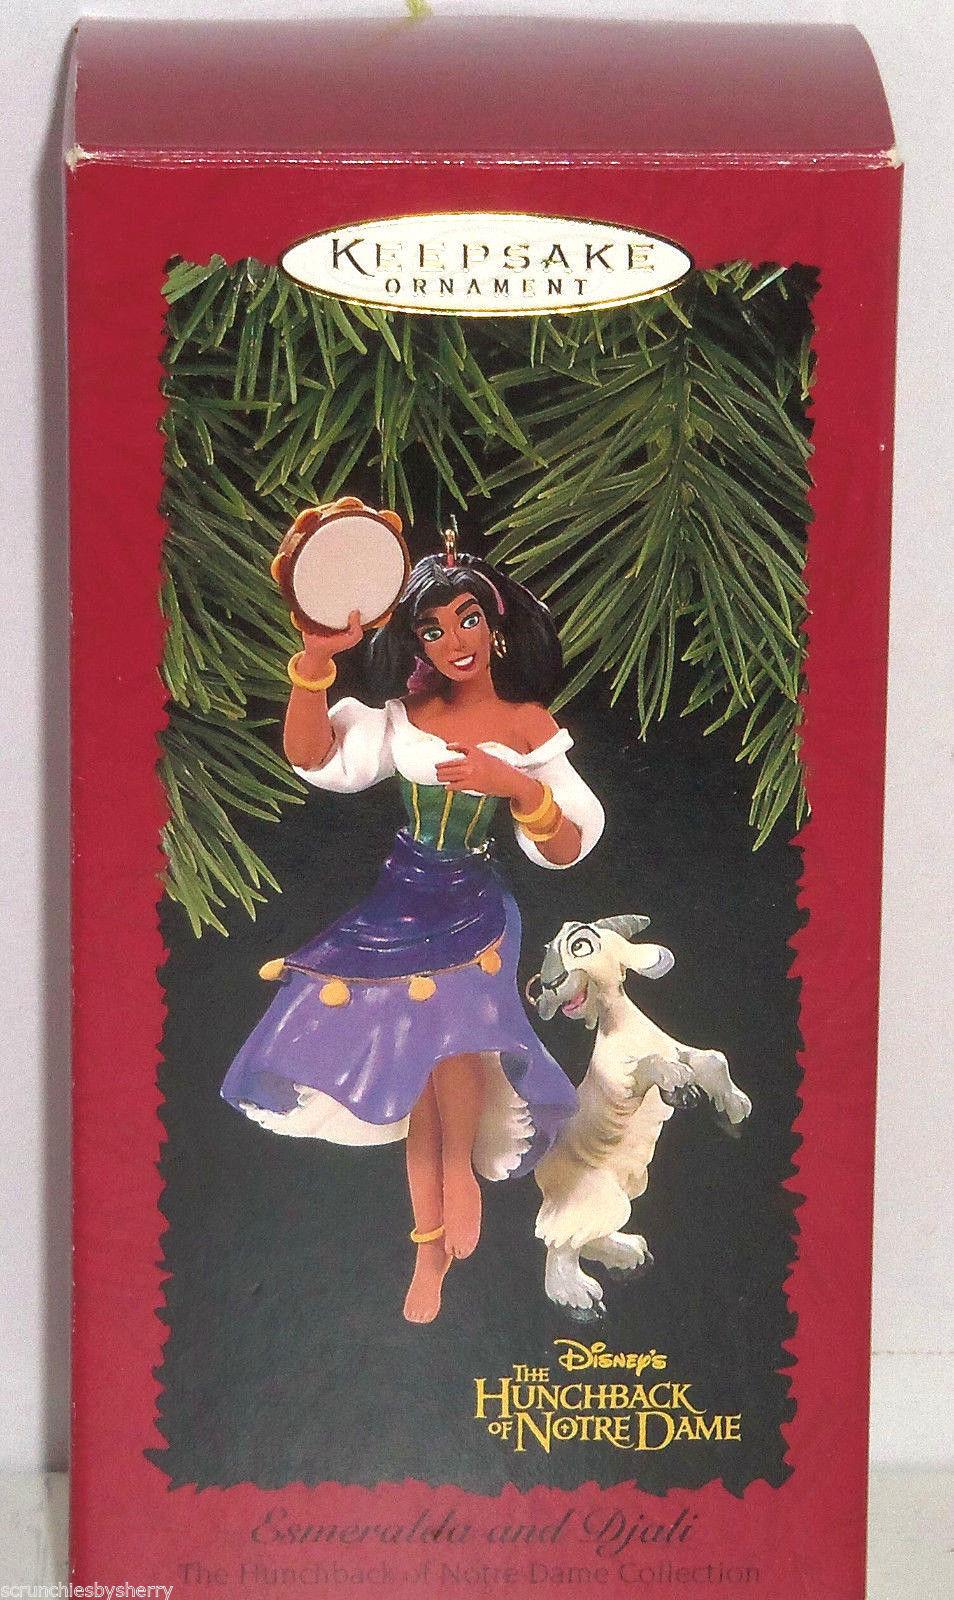 Disney Esmeralda Djali Hunchback Notre Dame and 50 similar items